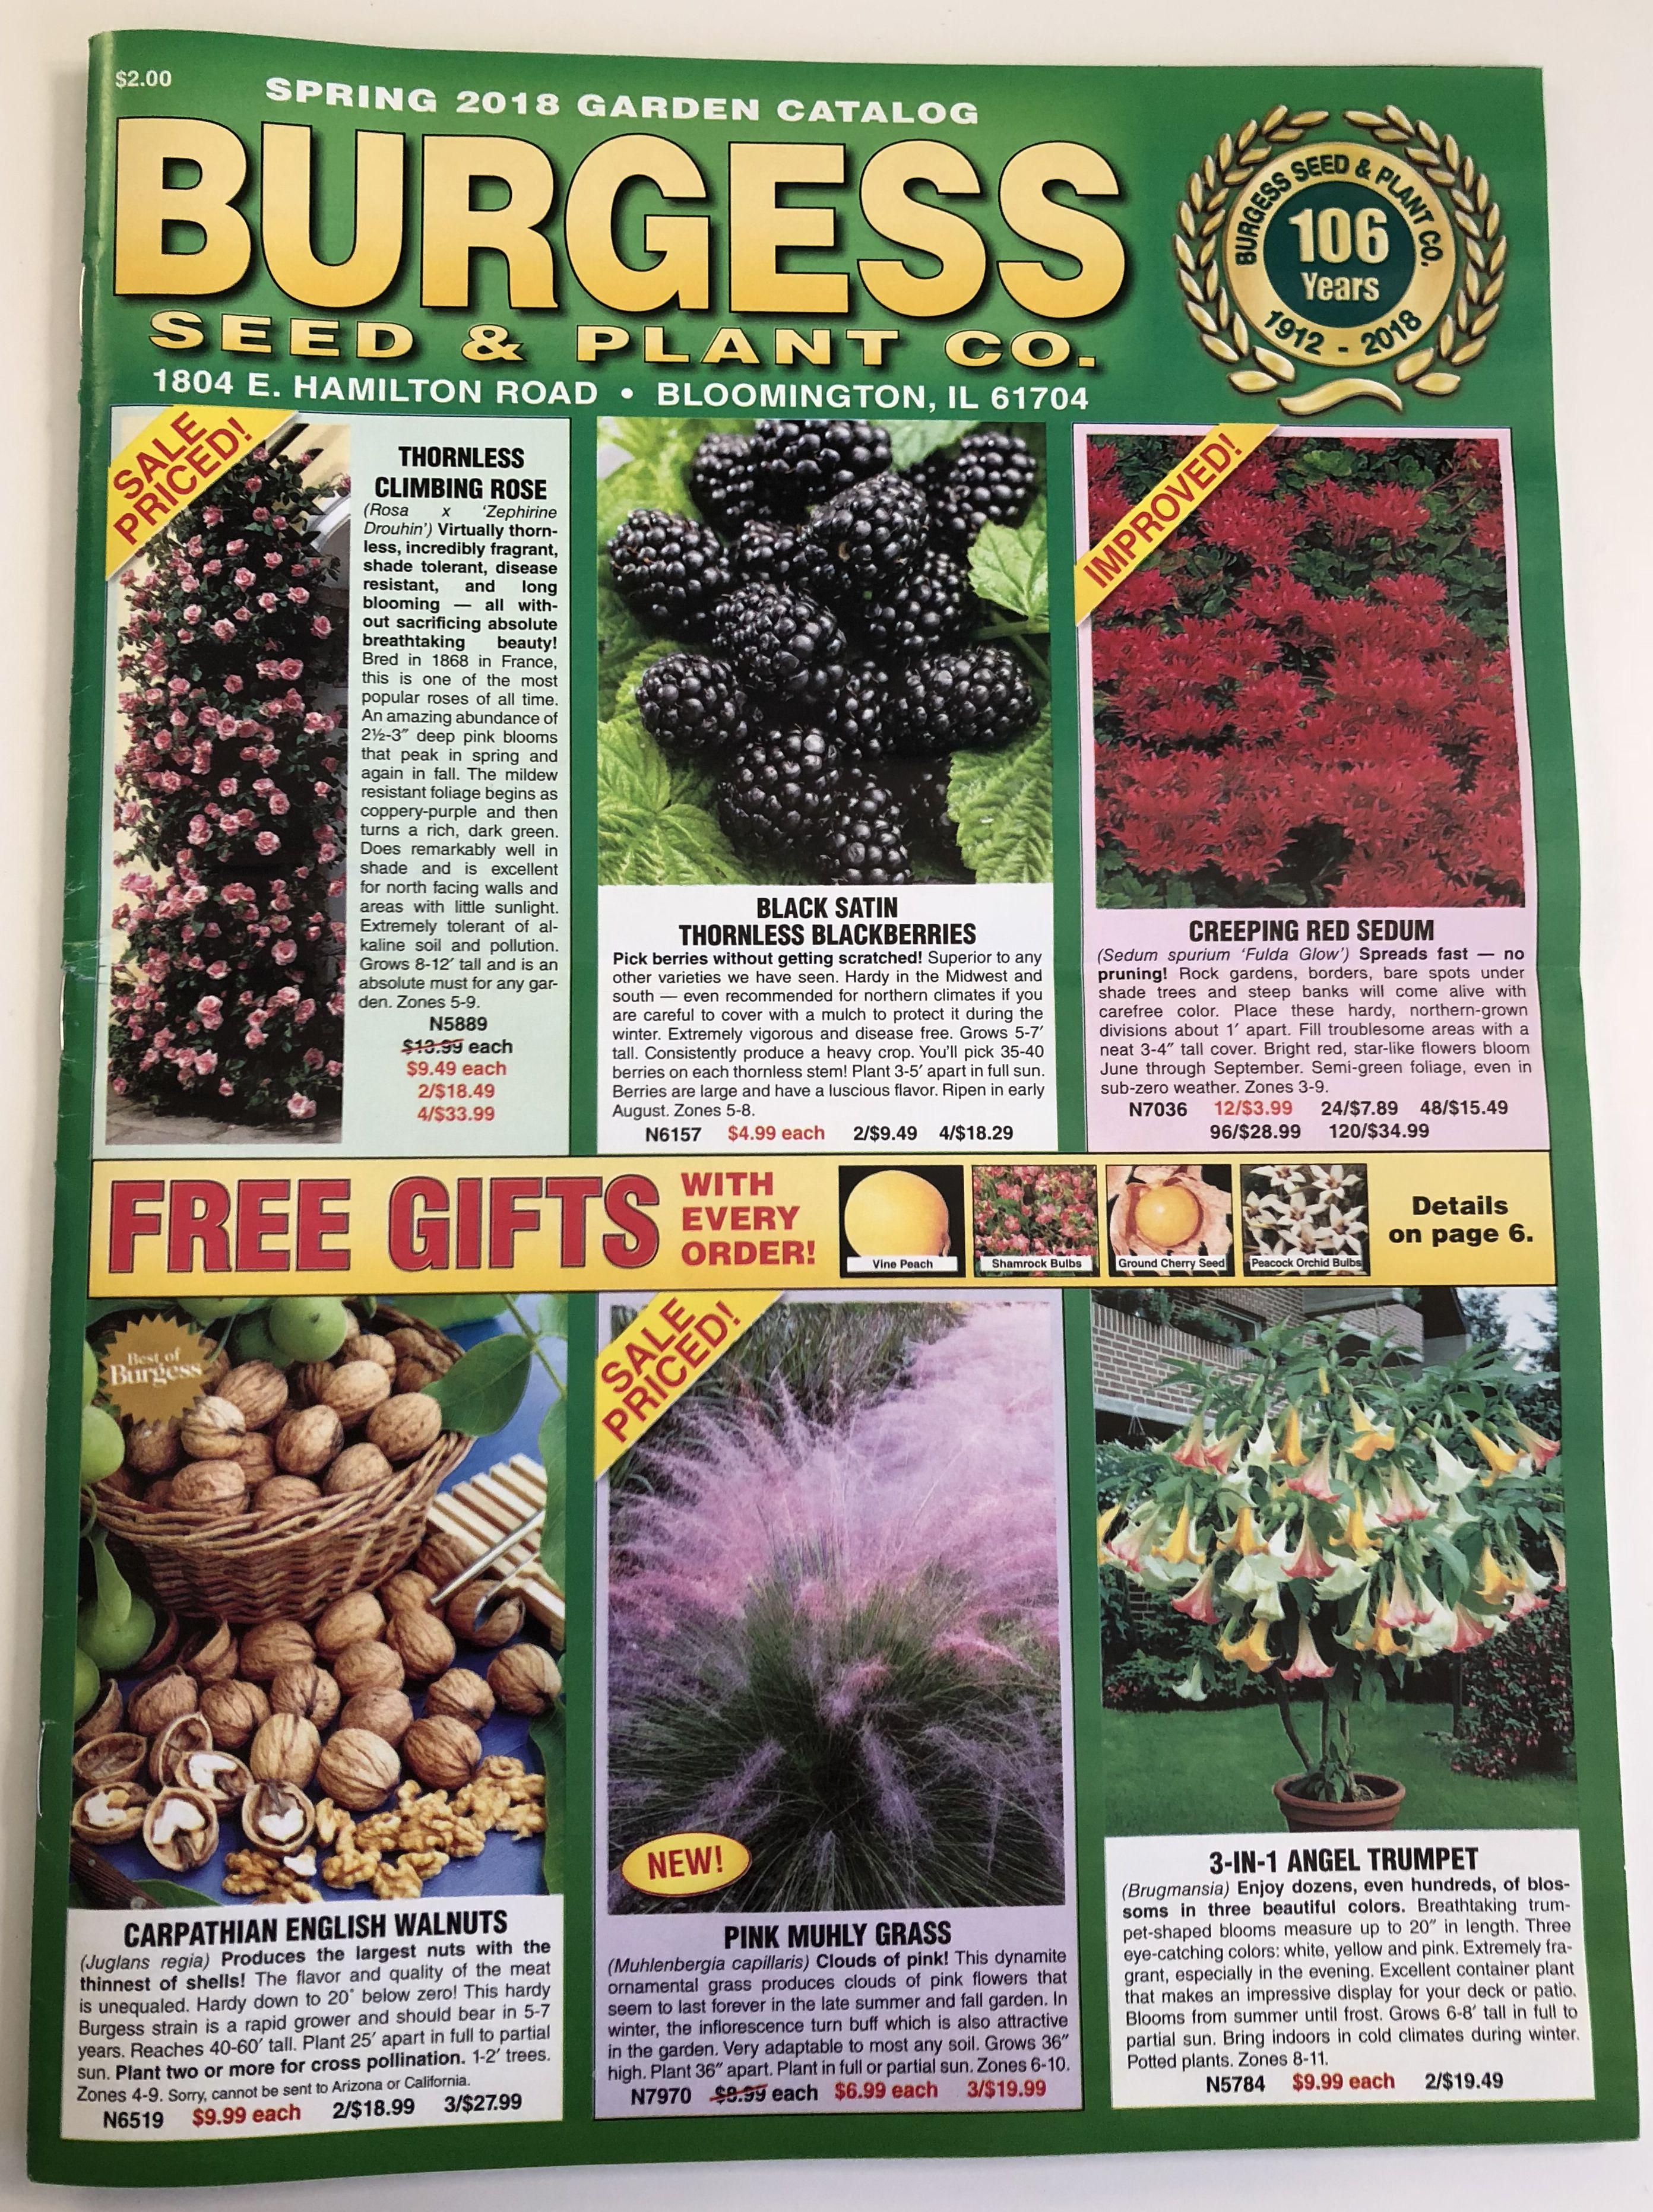 The 2018 Burgess seed catalog